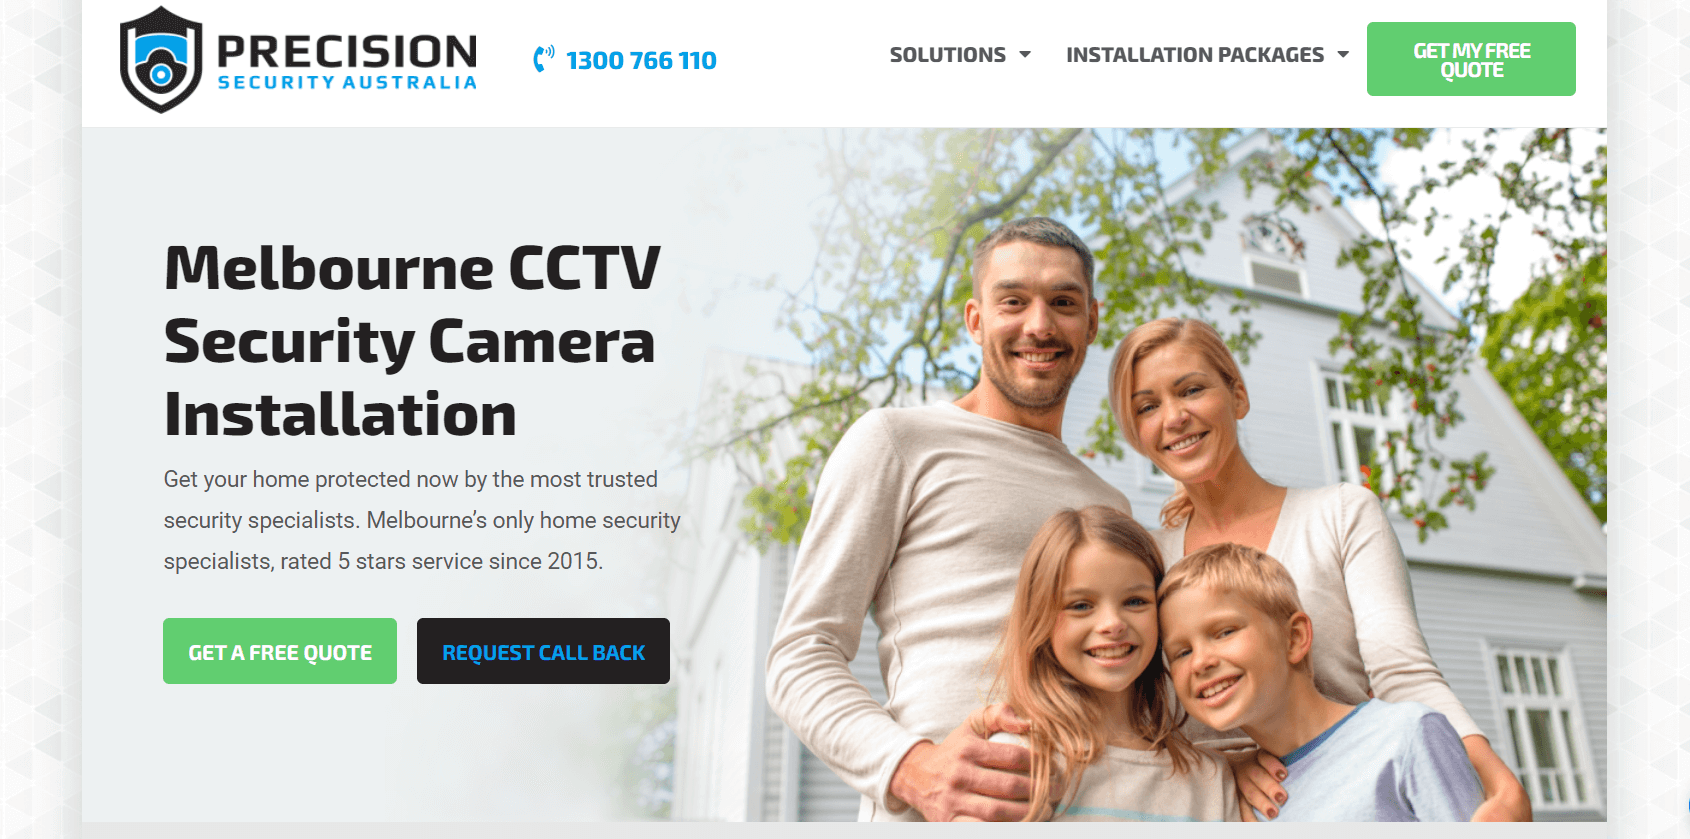 precision security australia